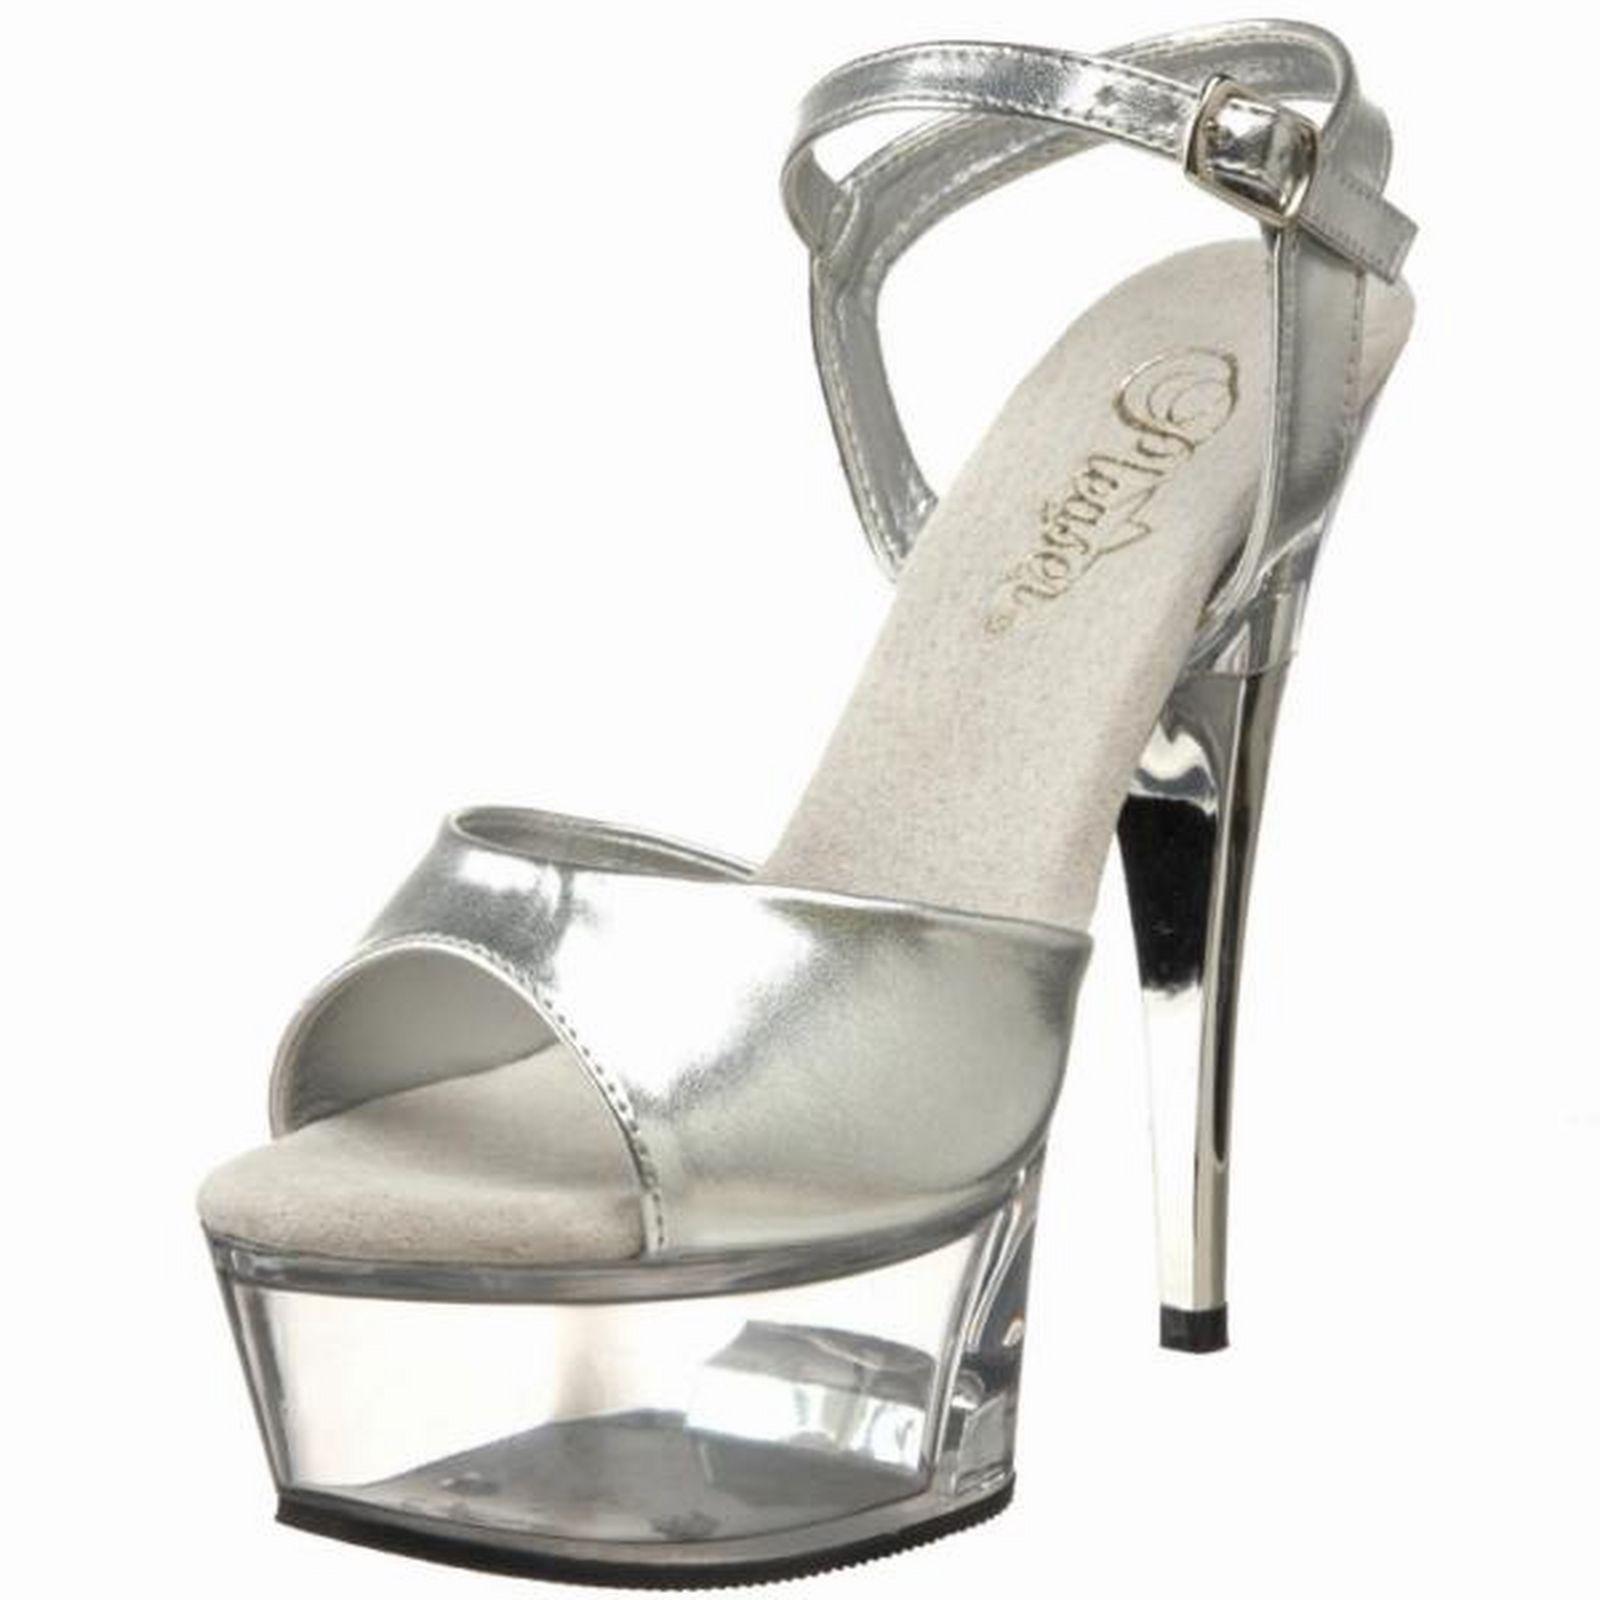 cb03cd1c43d Pleaser High Heel Silver Clear 6